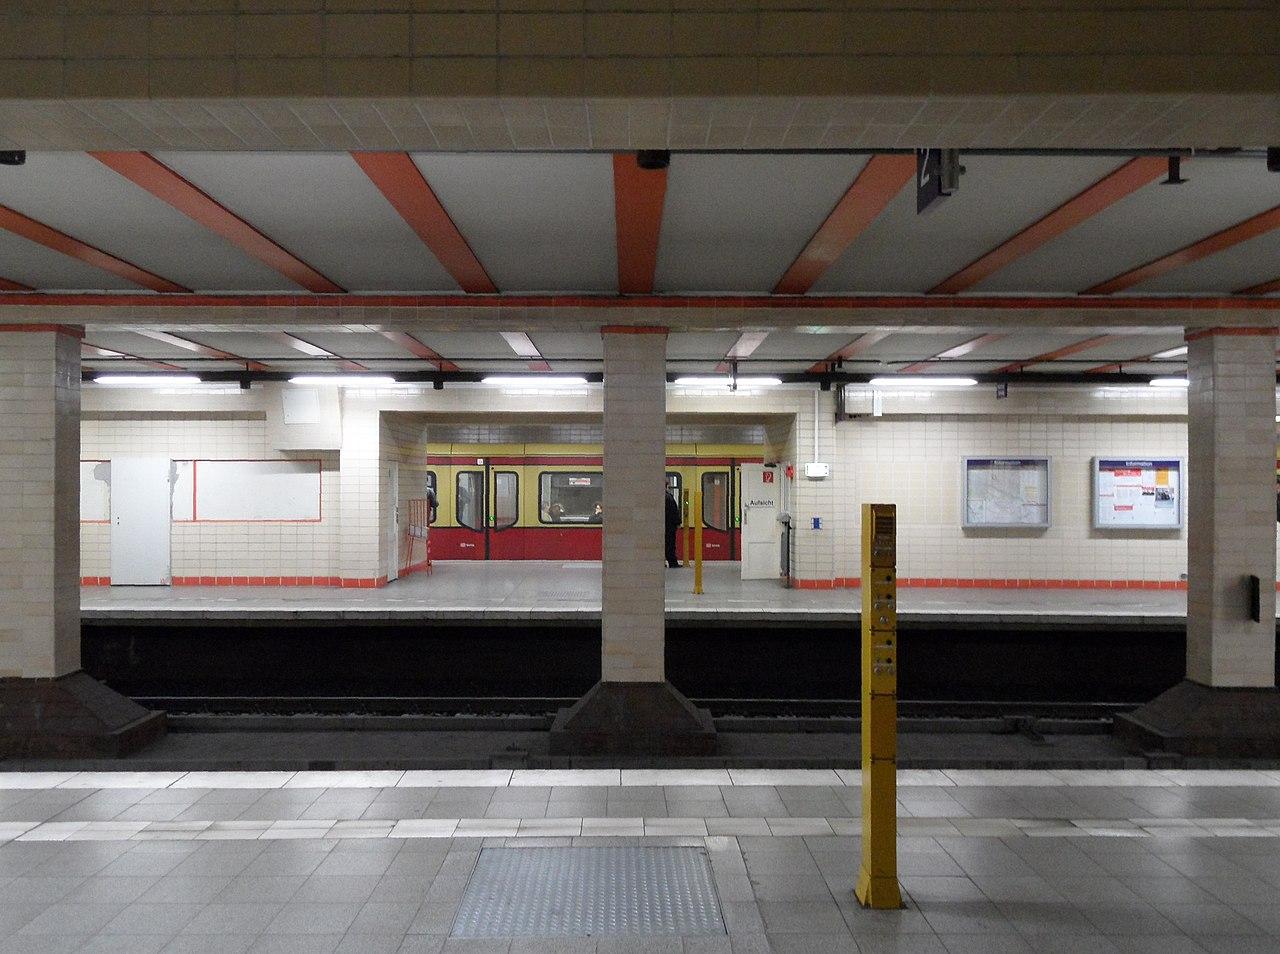 file berlin s bahnhof nordbahnhof linien s1 s2 s25 6595531471 jpg wikimedia commons. Black Bedroom Furniture Sets. Home Design Ideas